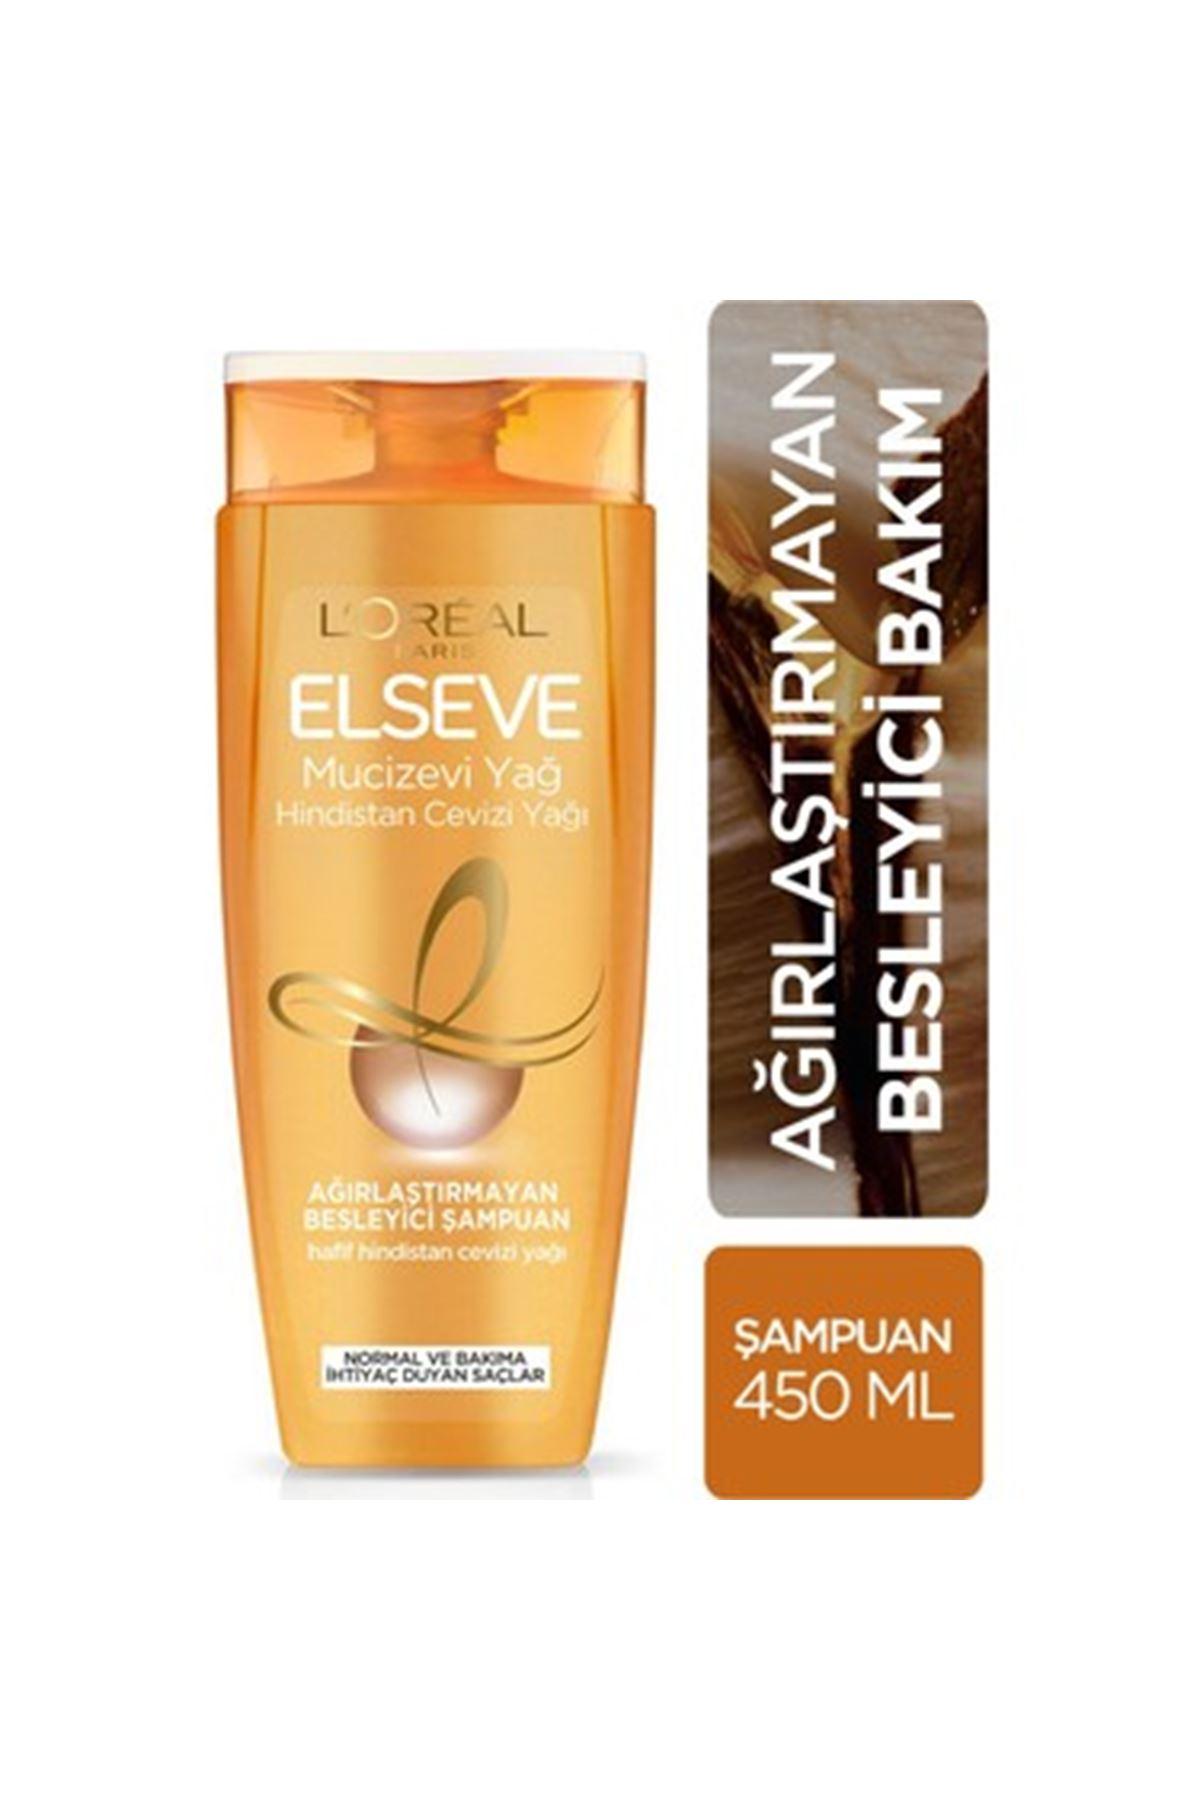 L'Oreal Paris Elseve 6 Mucizevi Yağ Şampuan 450 ml